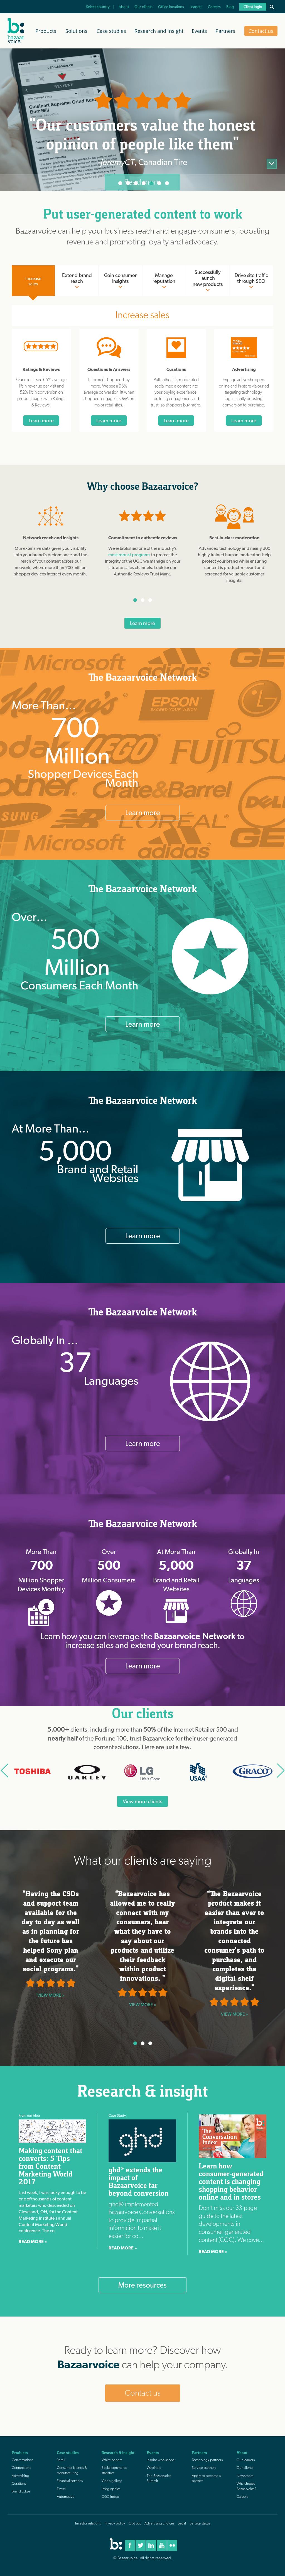 Bazaarvoice company profile revenue number of employees bazaarvoice website history biocorpaavc